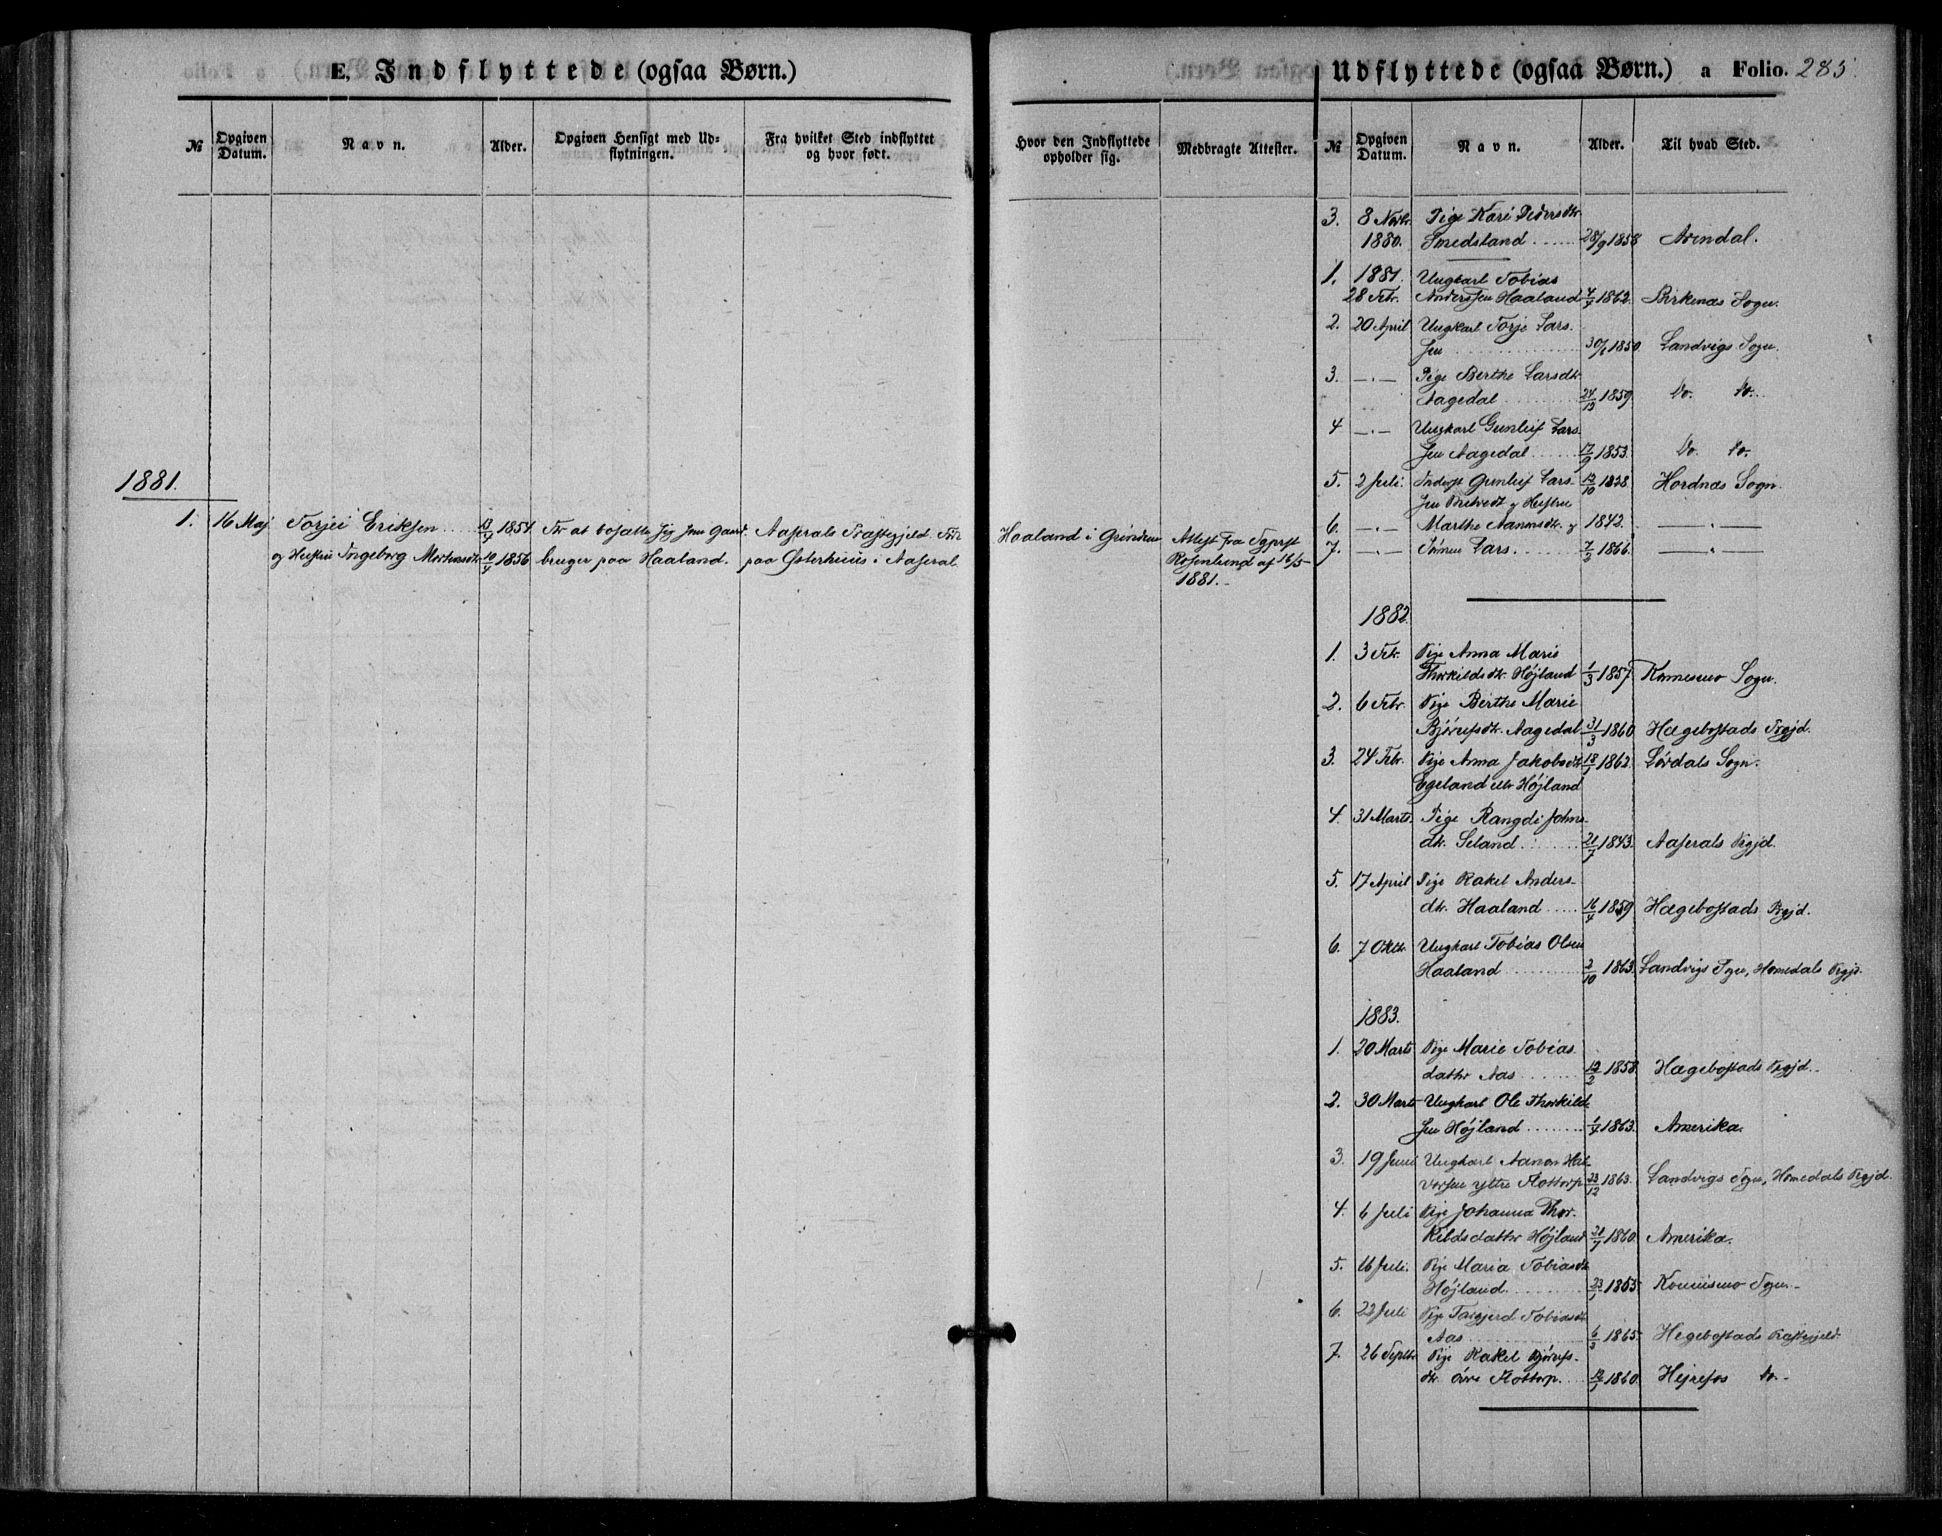 SAK, Bjelland sokneprestkontor, F/Fa/Fac/L0002: Ministerialbok nr. A 2, 1866-1887, s. 285